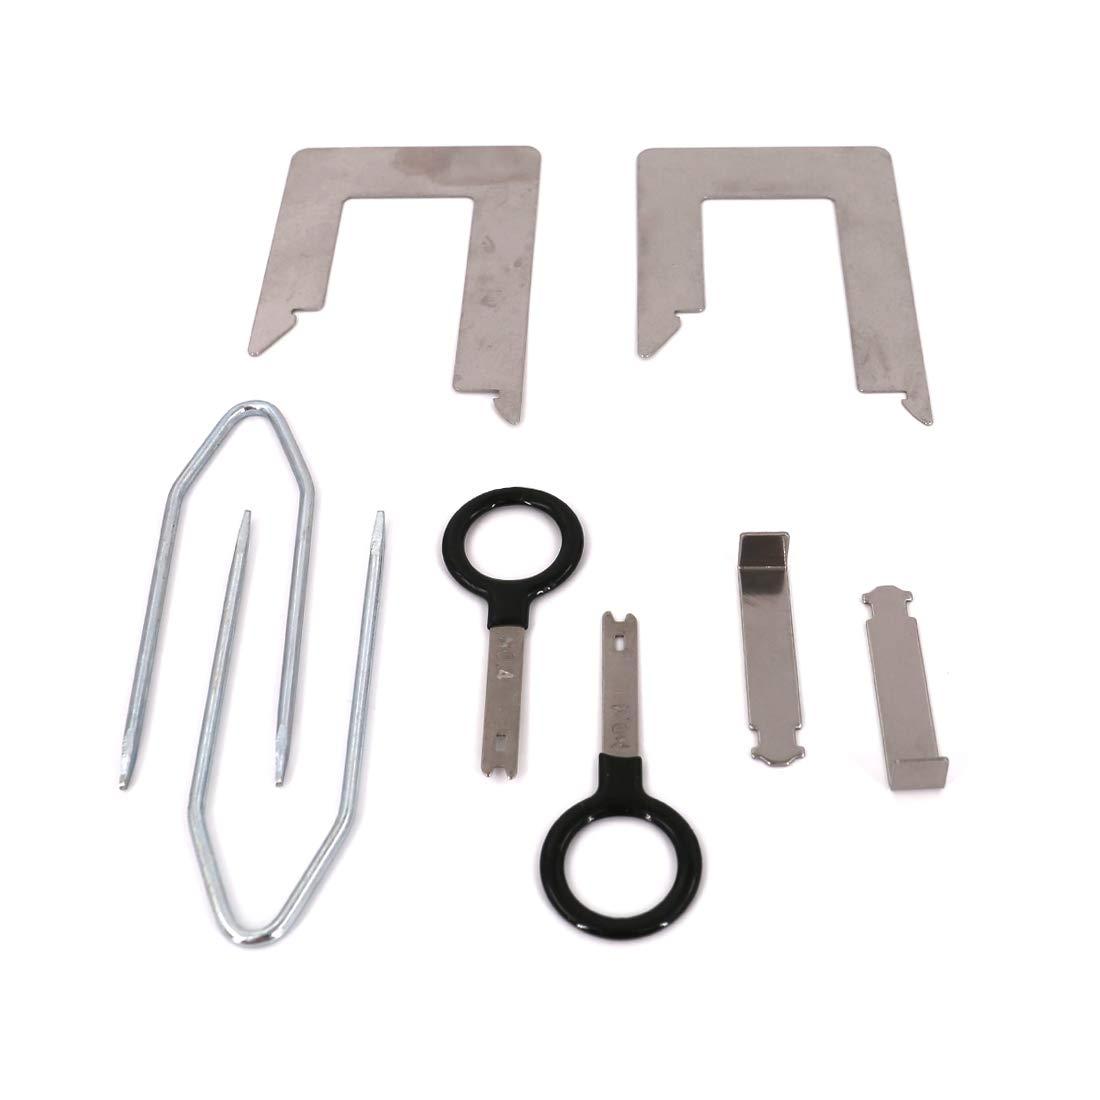 Upholstery & Trim Tools UTSAUTO 20 Pcs Radio Removal Tool Kit ...